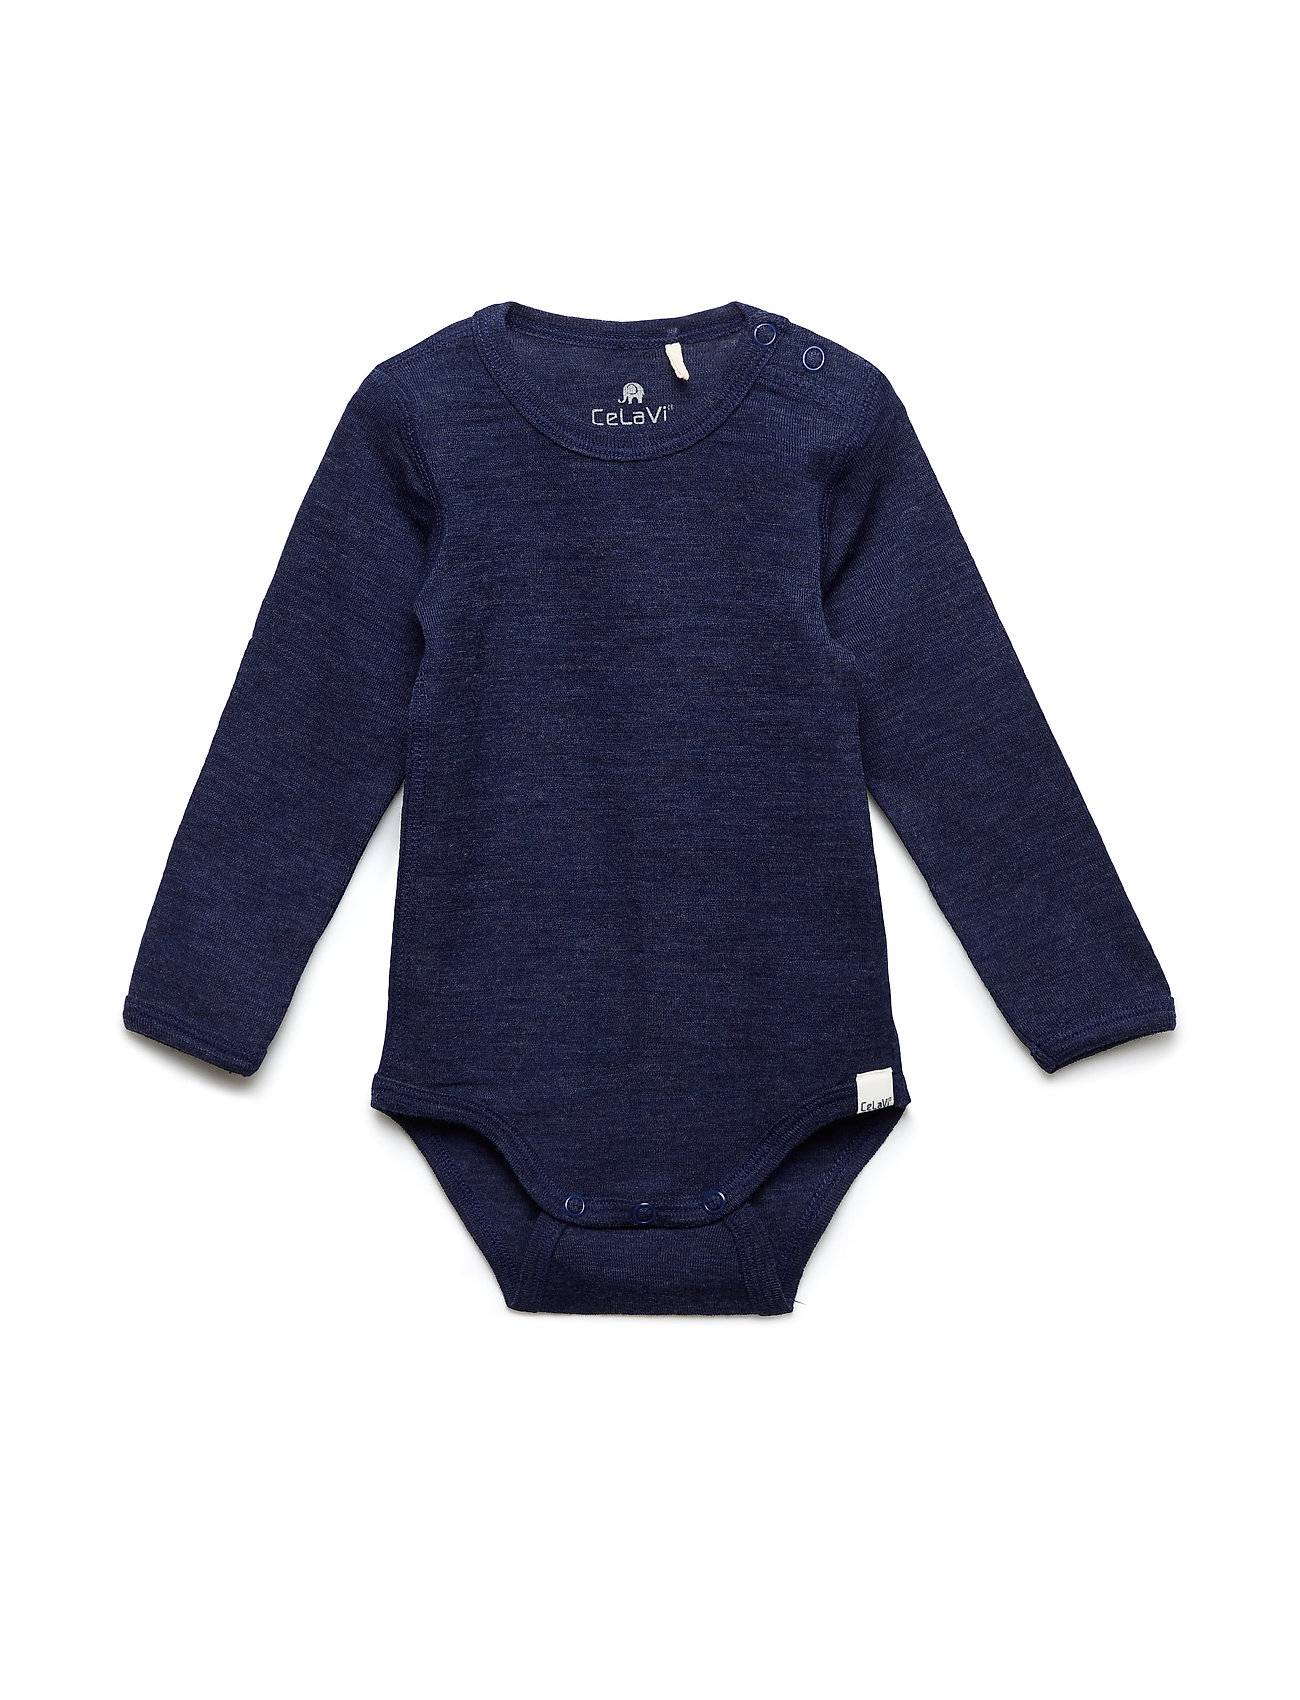 CeLaVi Body Ls - Solid Wonder Wollies Bodies Long-sleeved Sininen CeLaVi